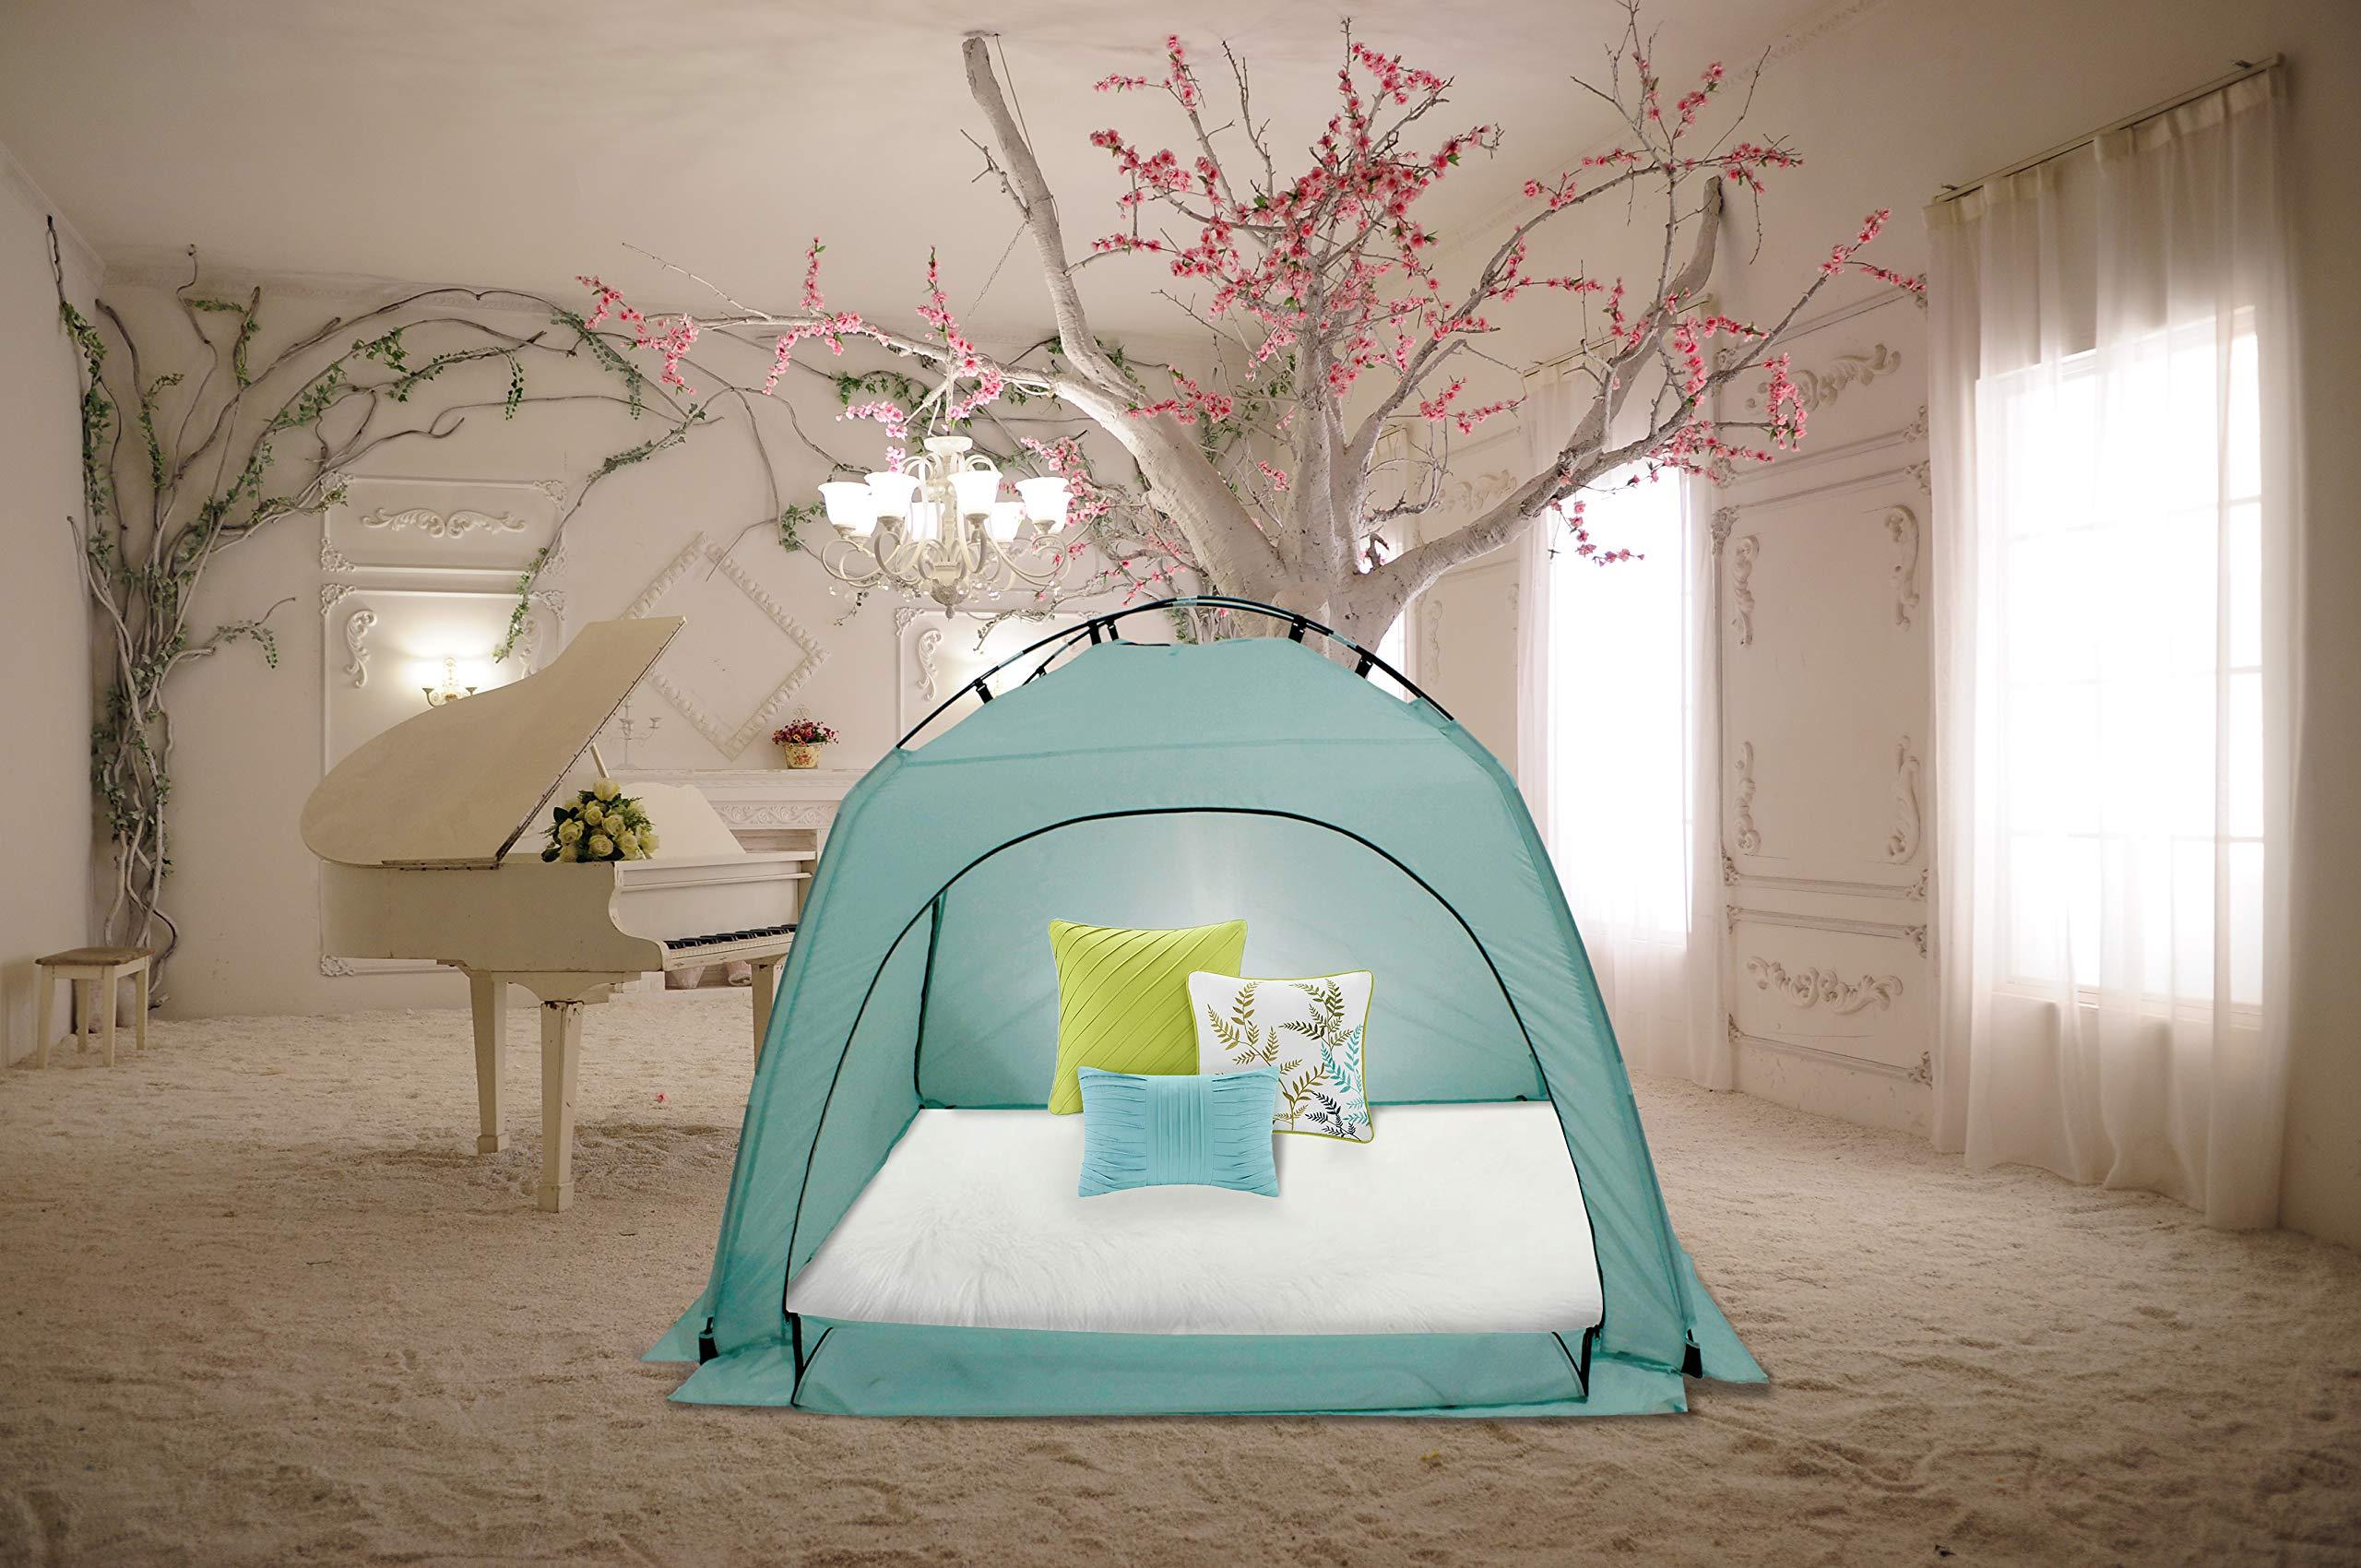 FeelingLove on on Bed/Warm Cozy Sleep, BedTent, LiteBlue Large